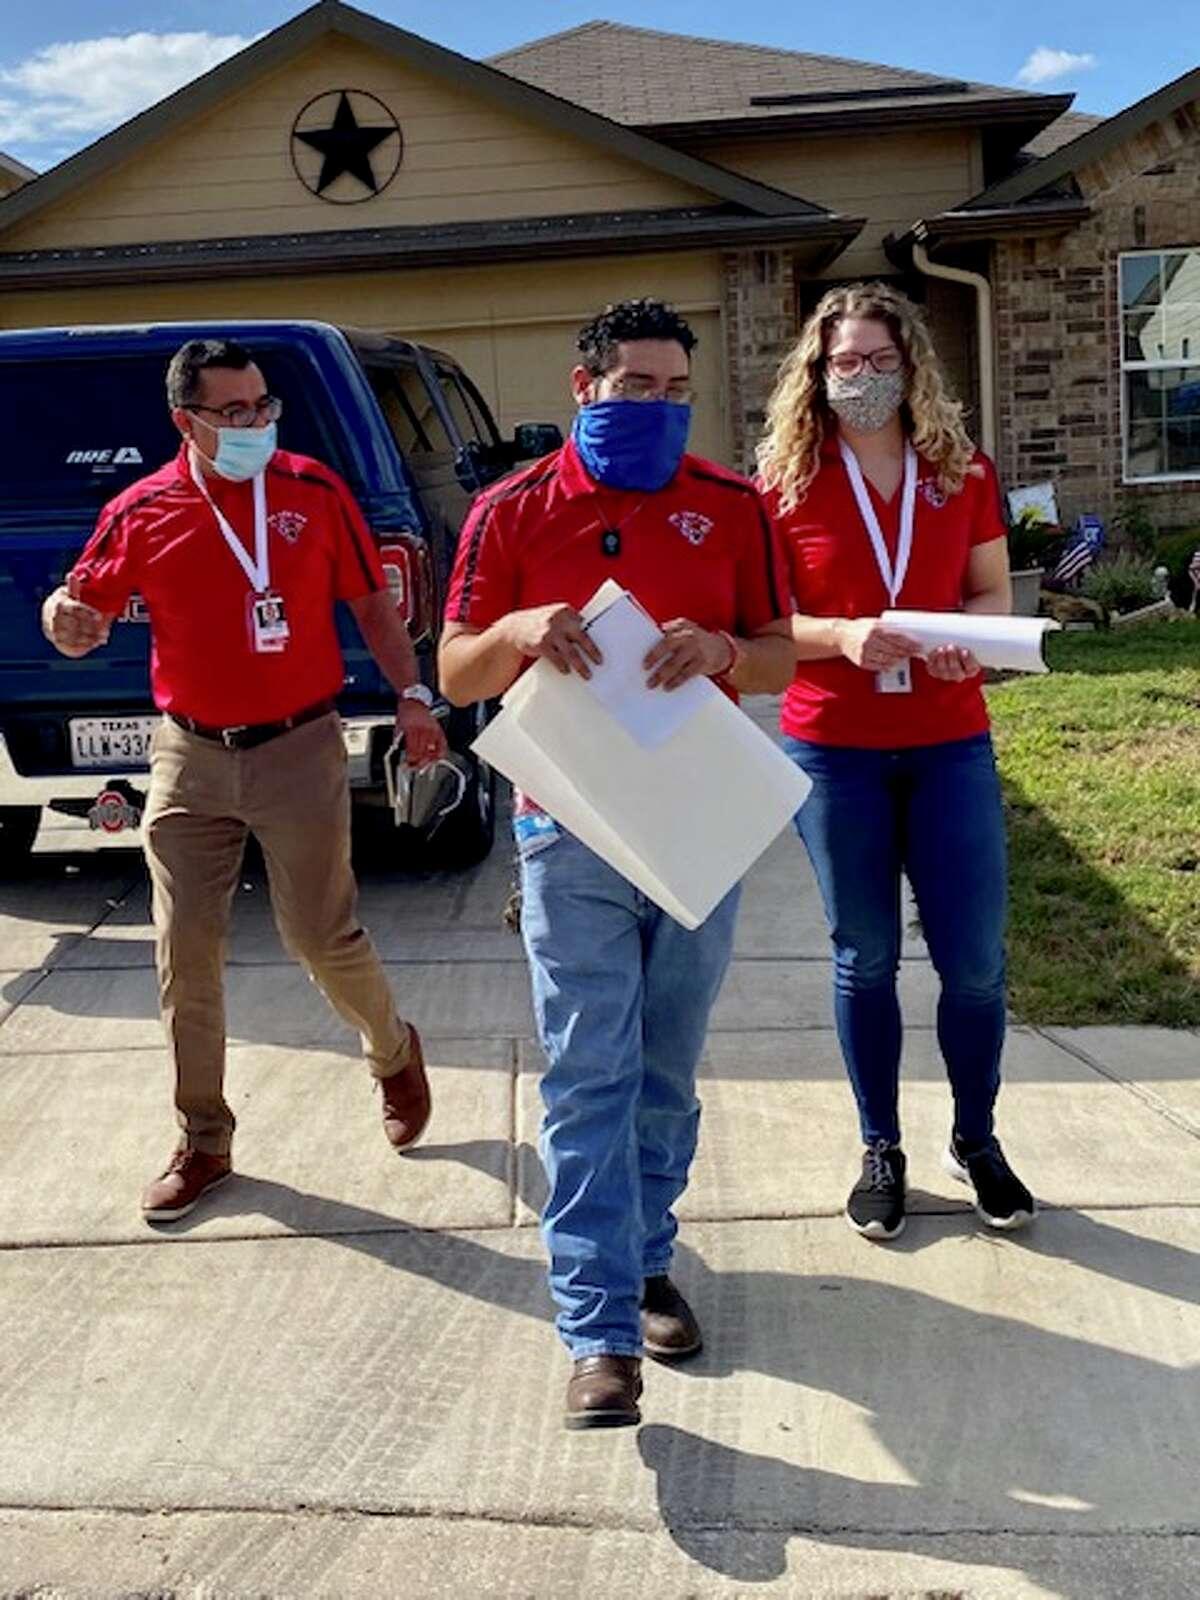 Southside ISD Superintendent Mr. Rolando Ramirez, custodian Mr. Paul Marquez, and technology specialist Ms. Wendy Luna distribute flyers.